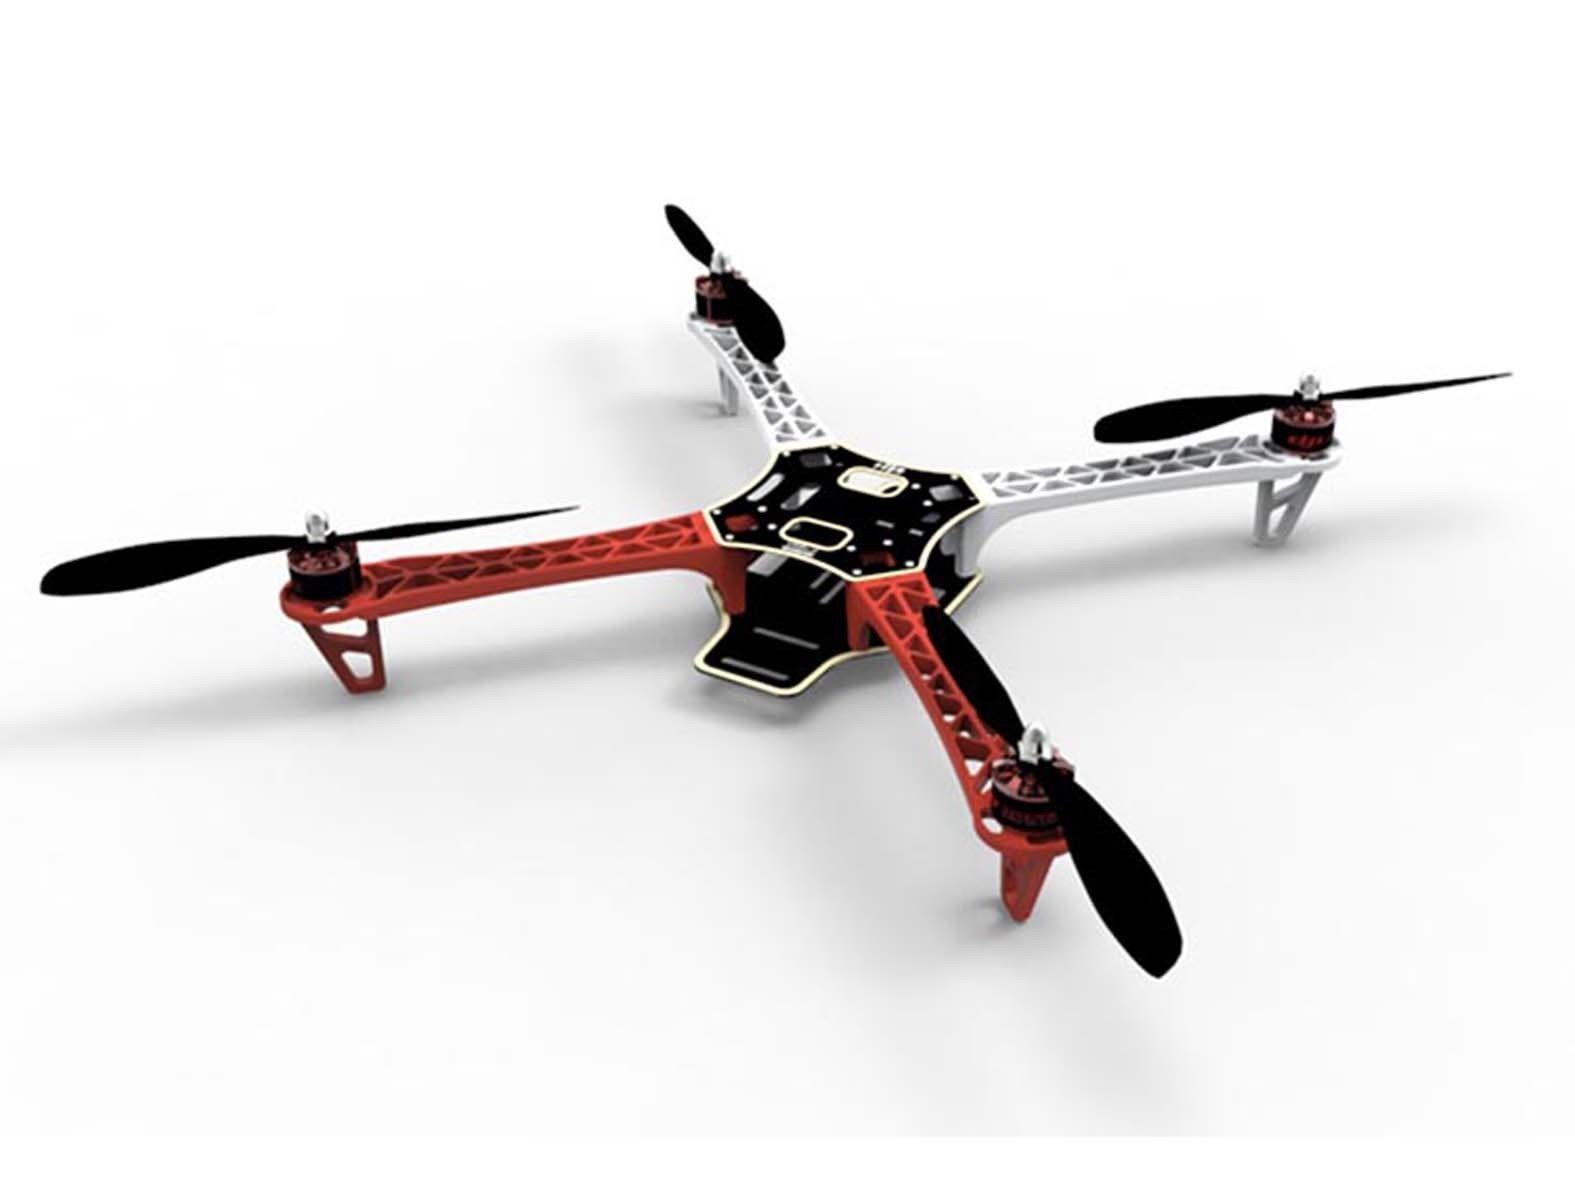 2018 F450 ATF Quadcopter Frame Hobbypower 920KV Motor DYS Simonk 30A ...